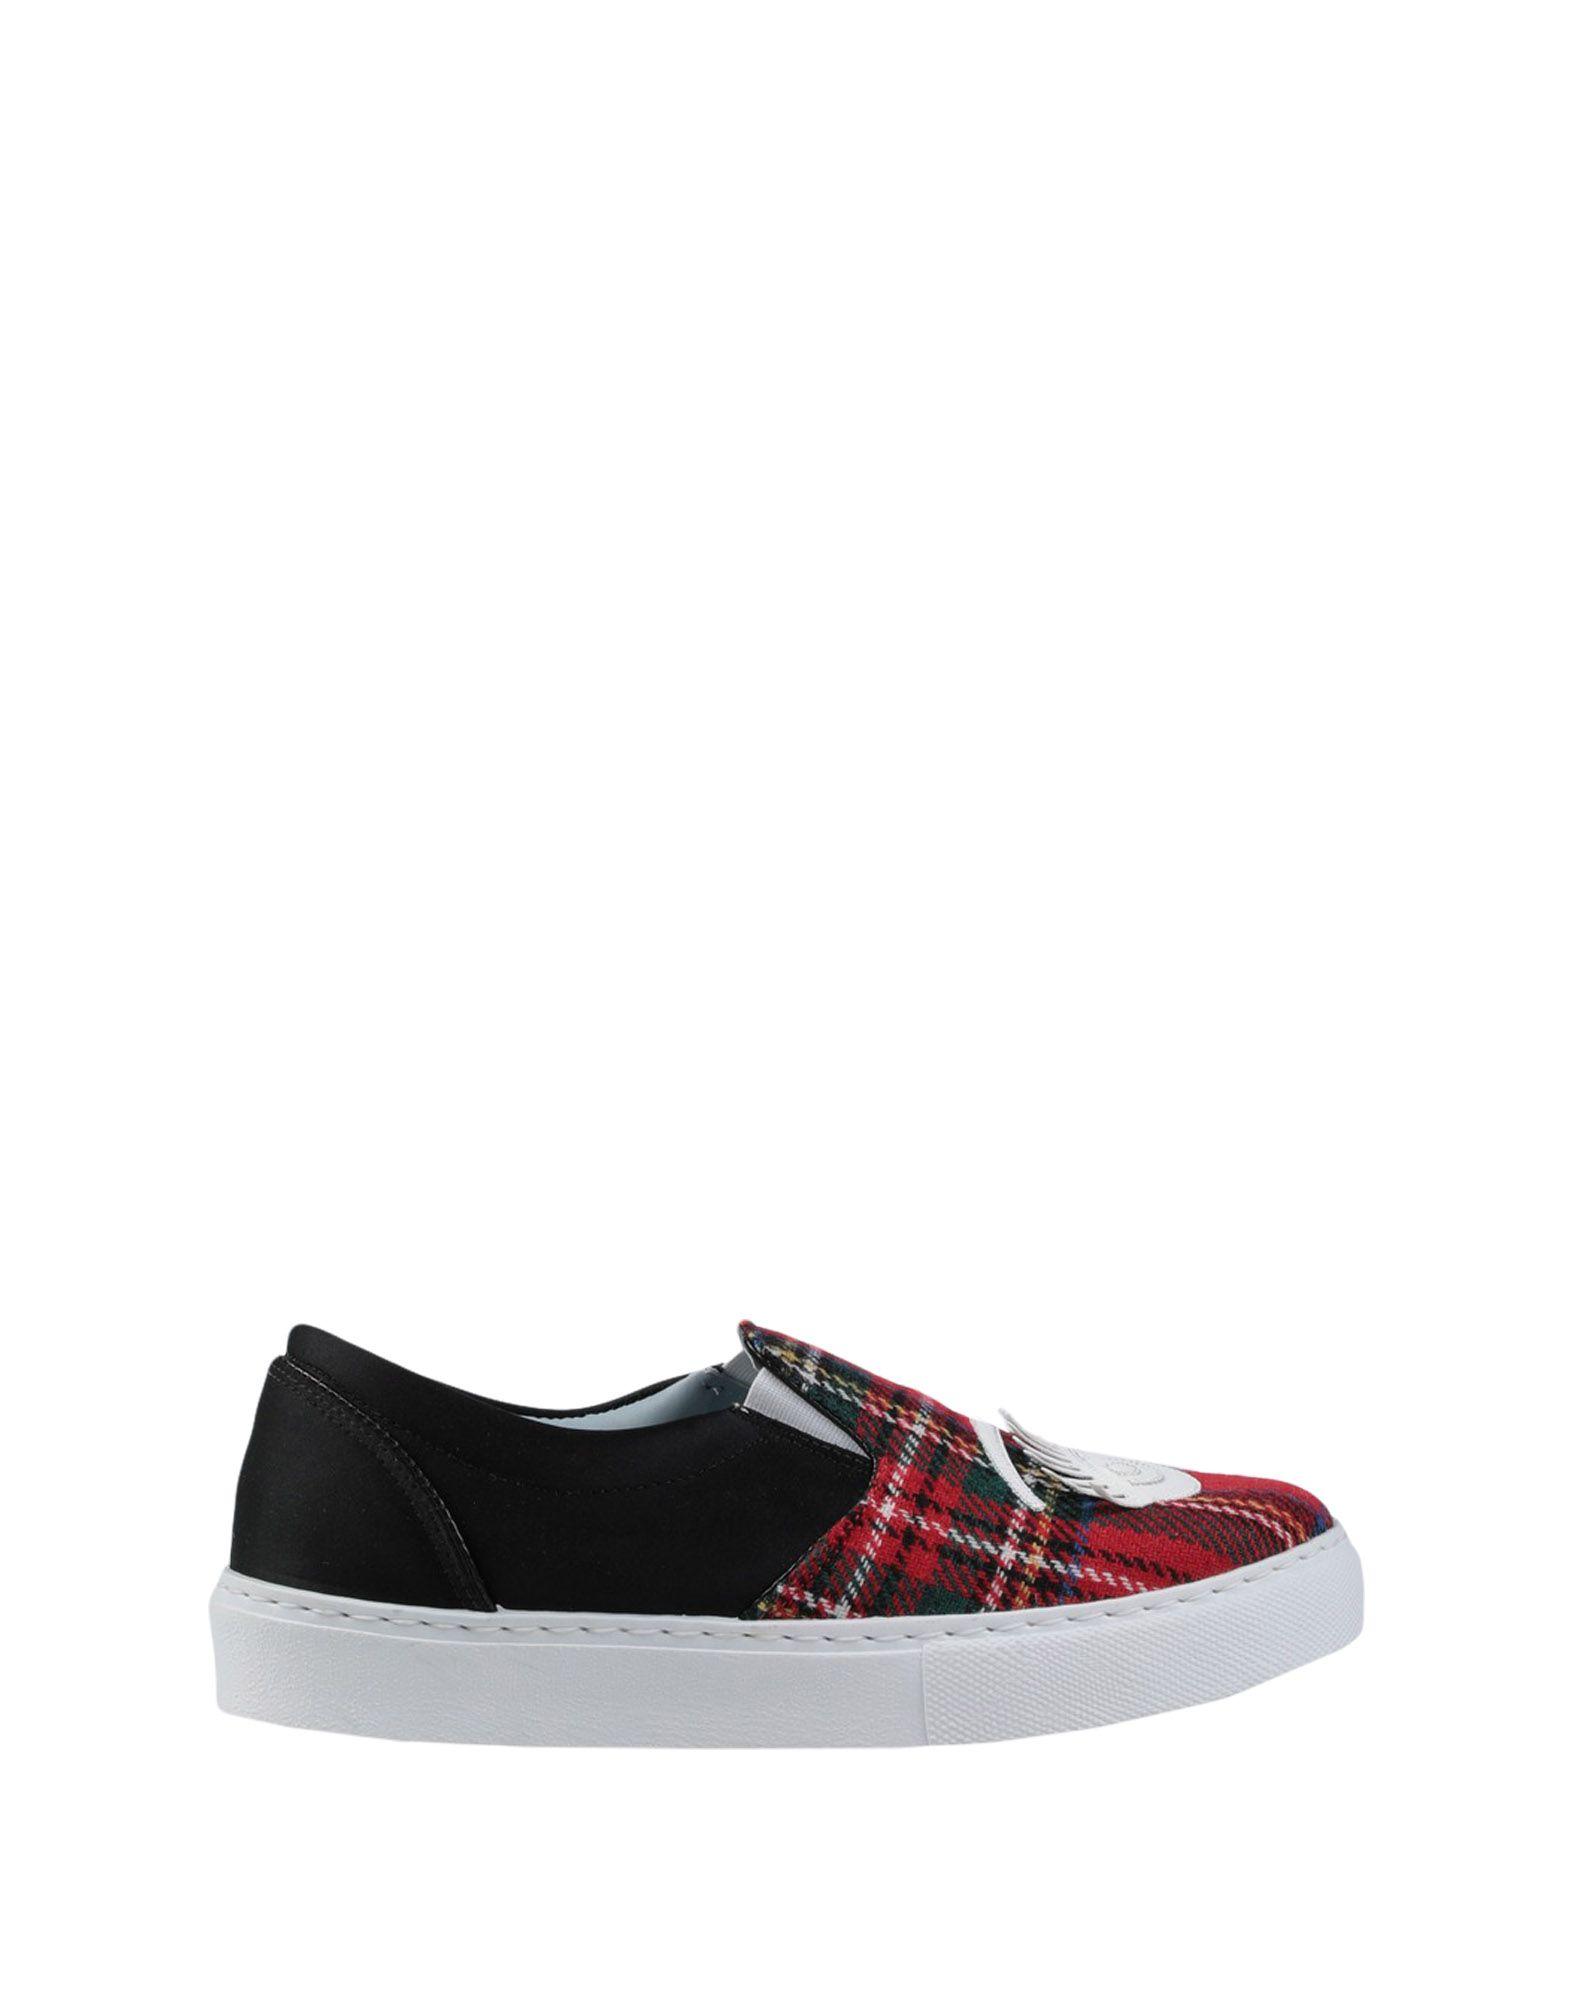 Stilvolle billige Sneakers Schuhe Chiara Ferragni Sneakers billige Damen  11550612QL 1c5c72